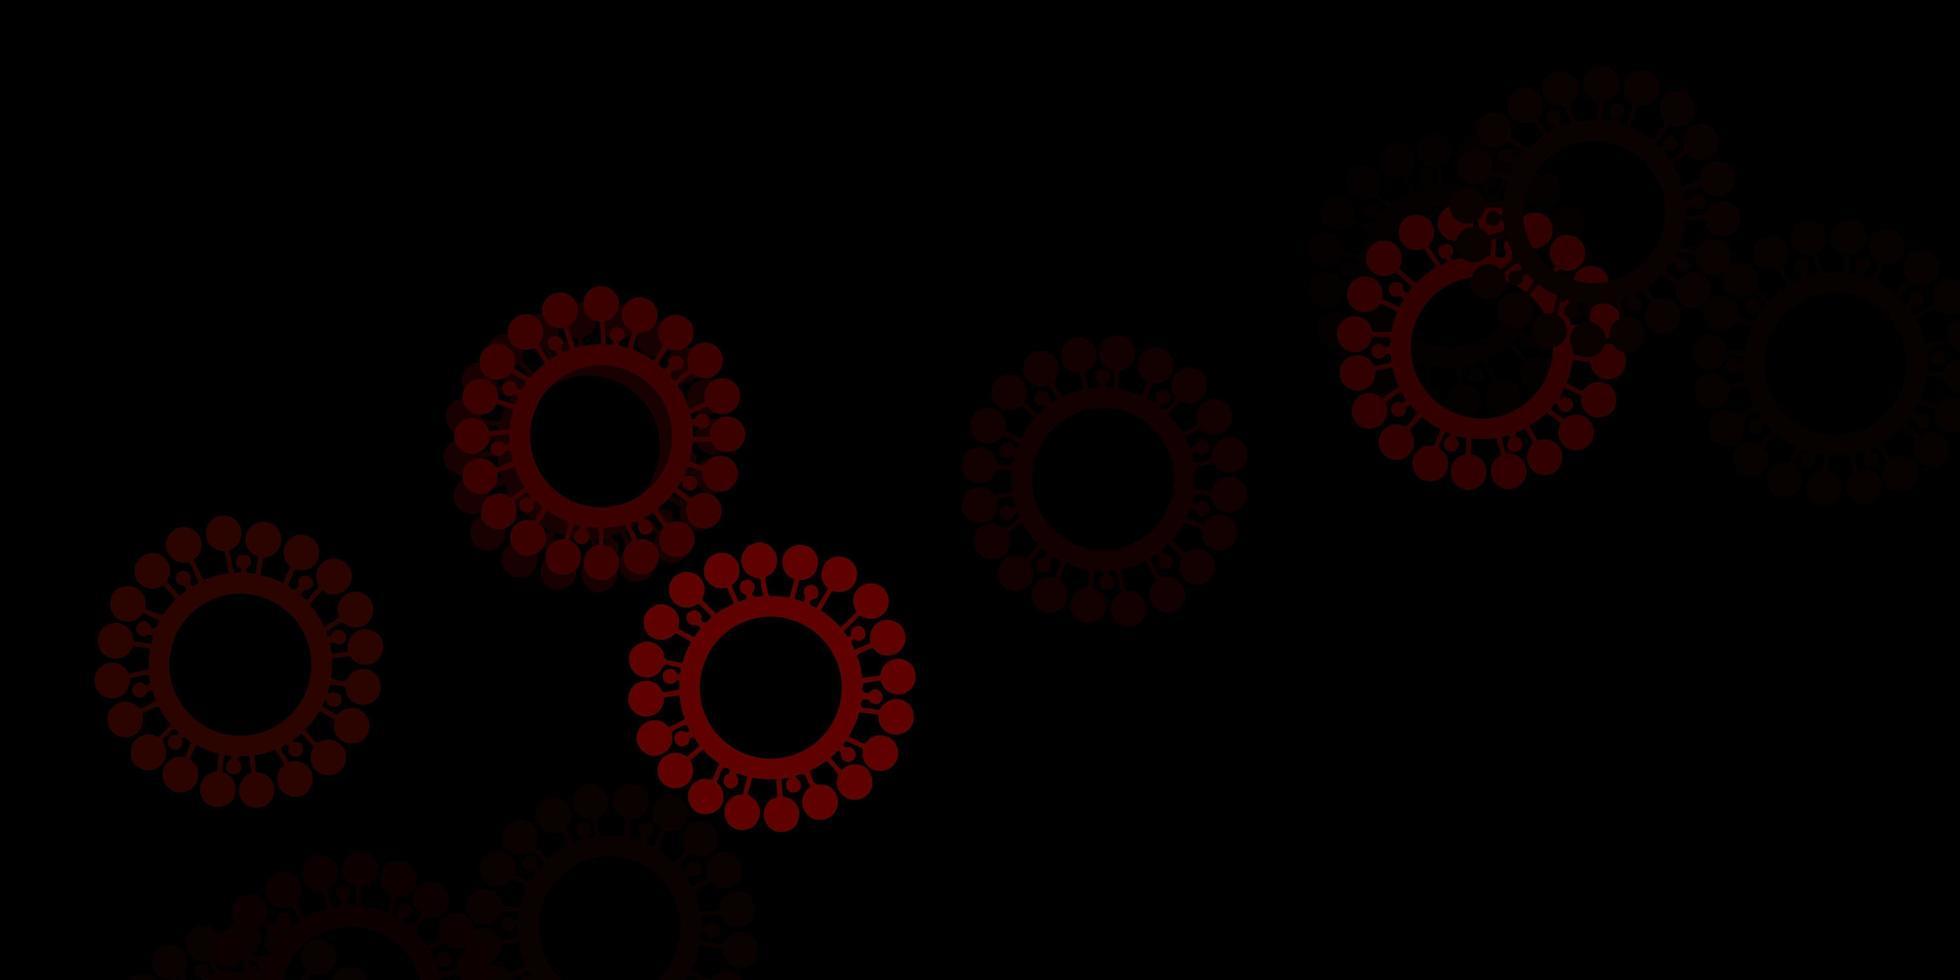 fond de vecteur marron foncé avec symboles covid-19